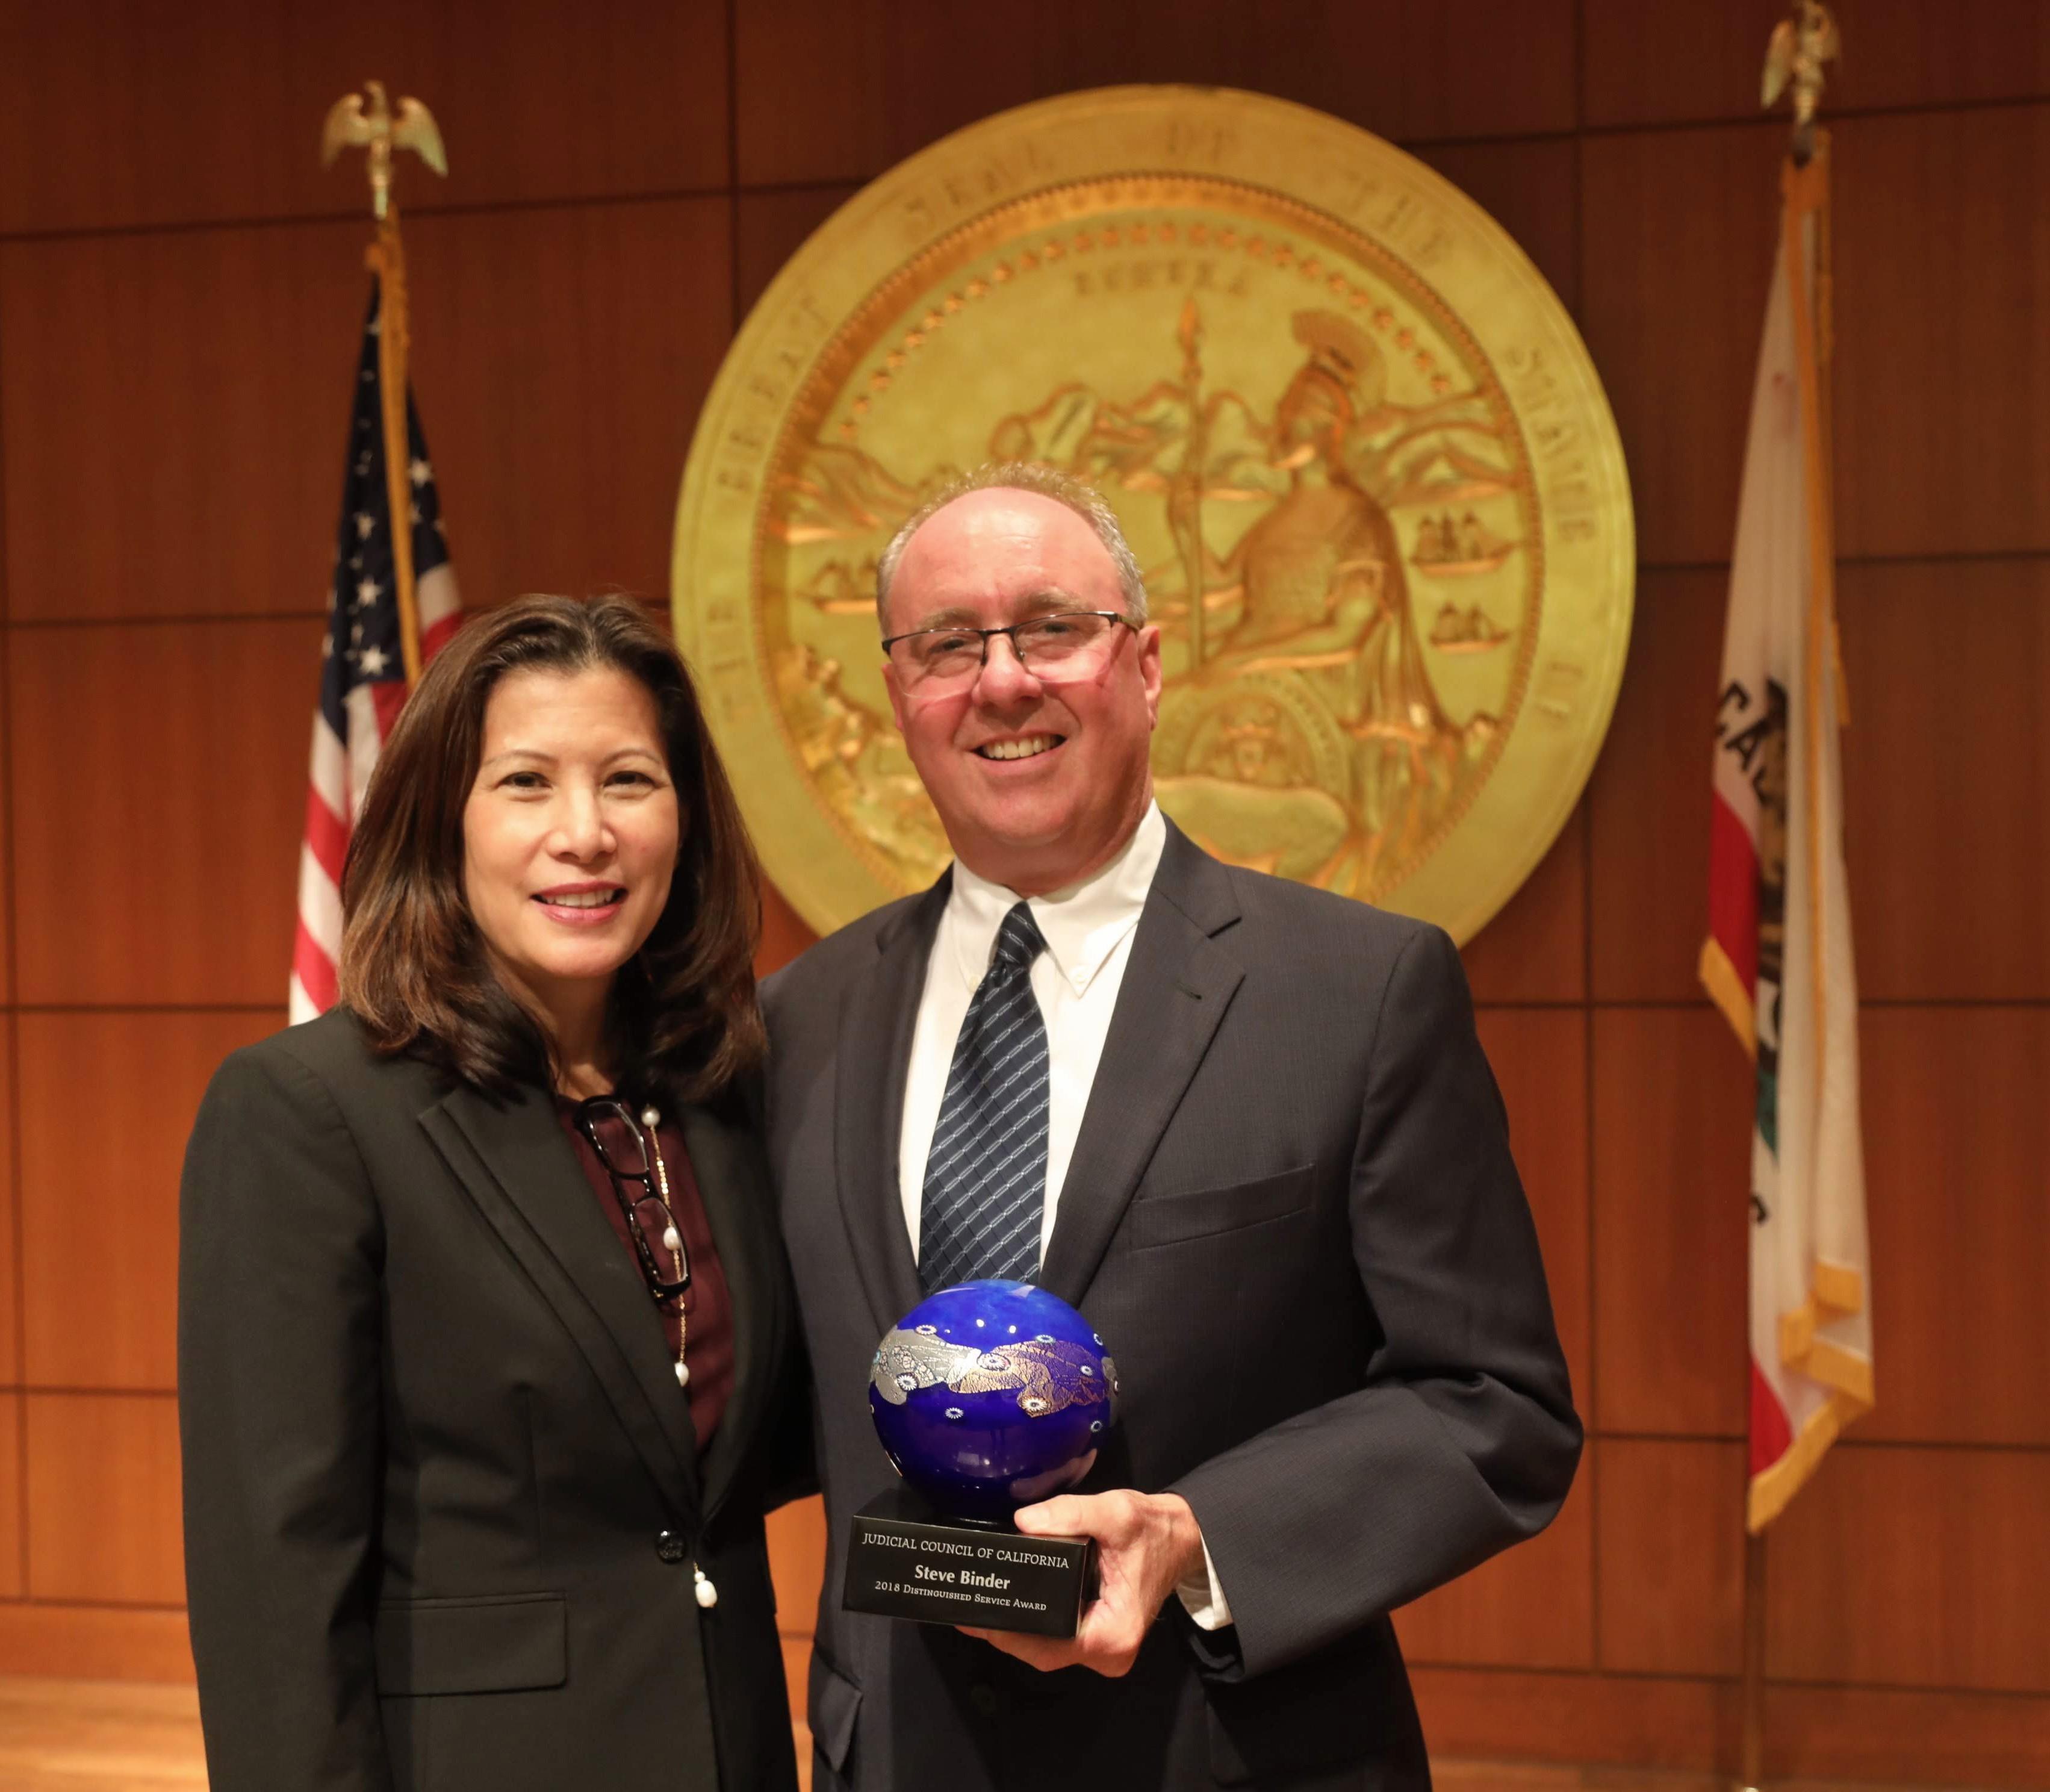 2018 Distinguished Service Award